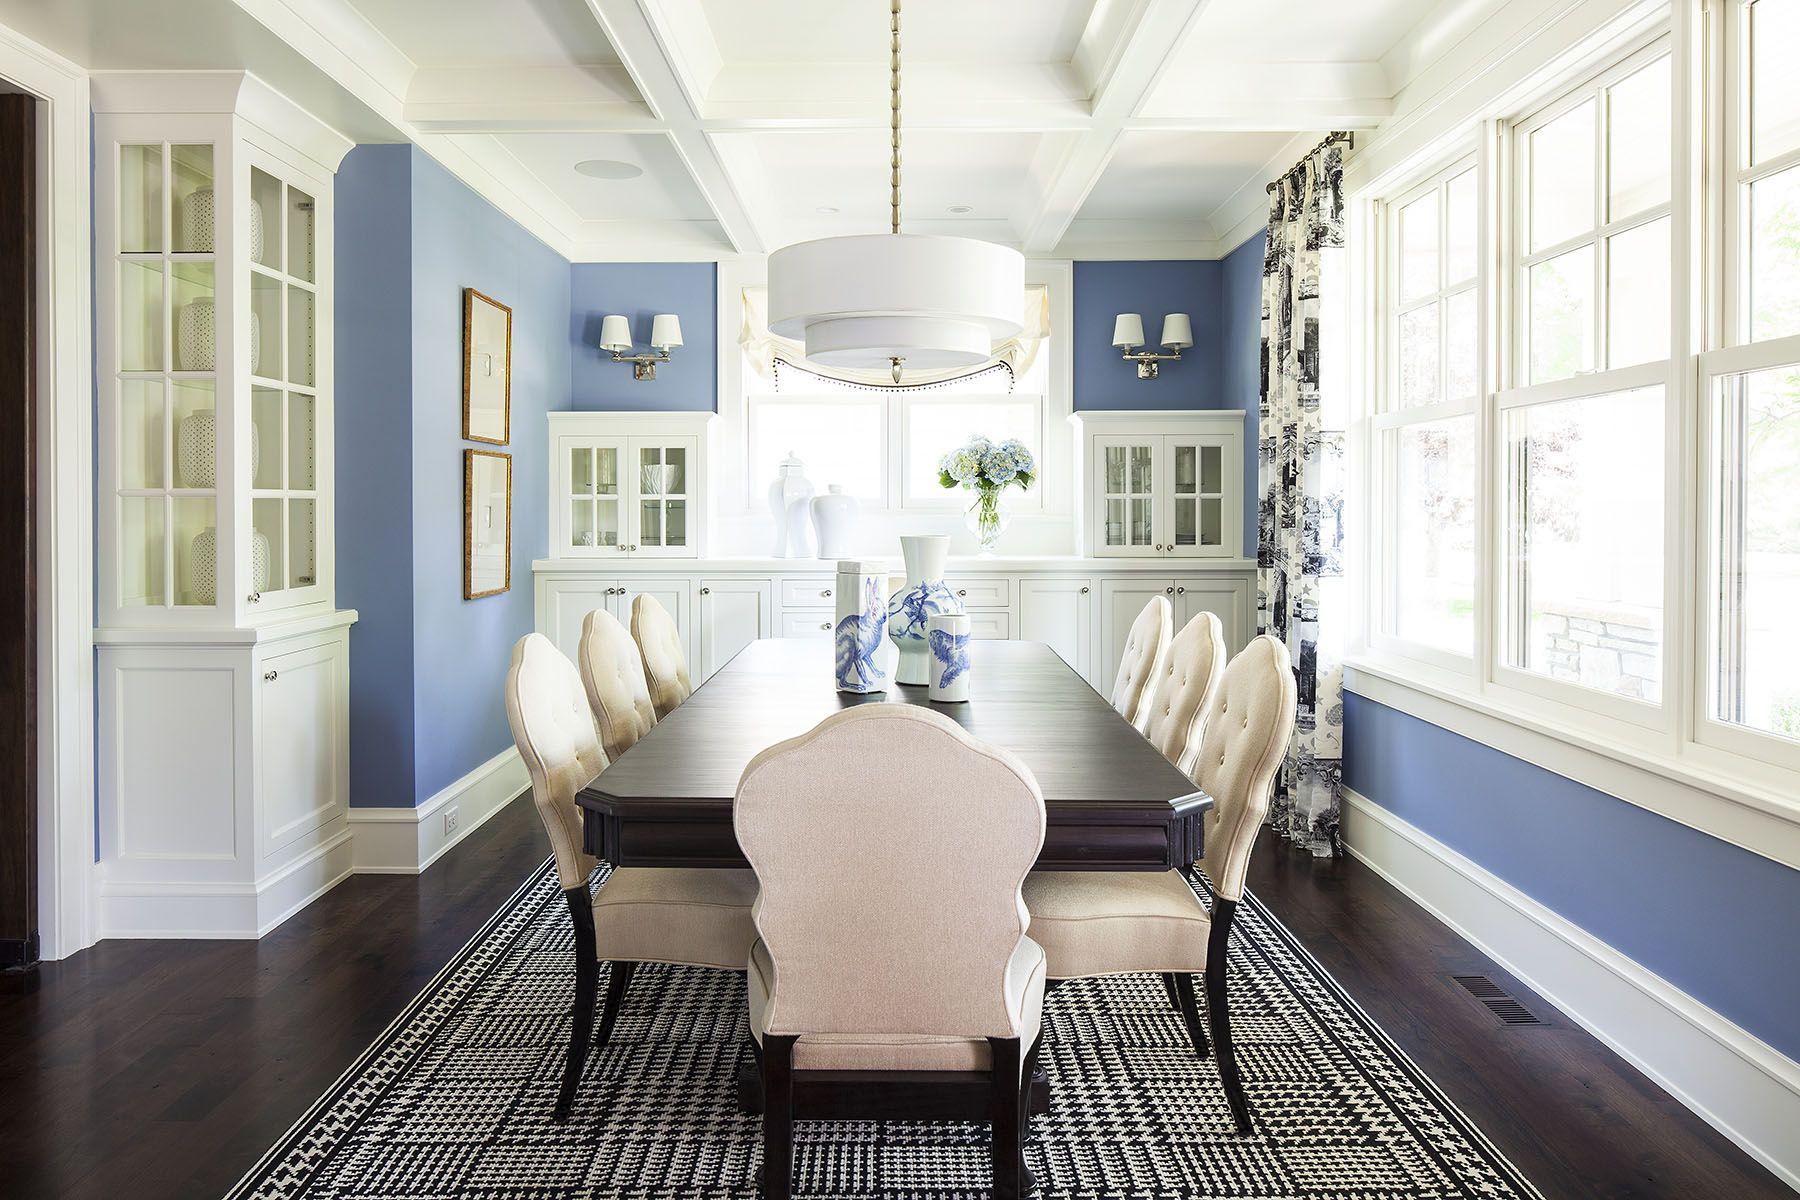 Residential - Model Home Designer(s): Autumn Muldowney, ASID Kristy ...